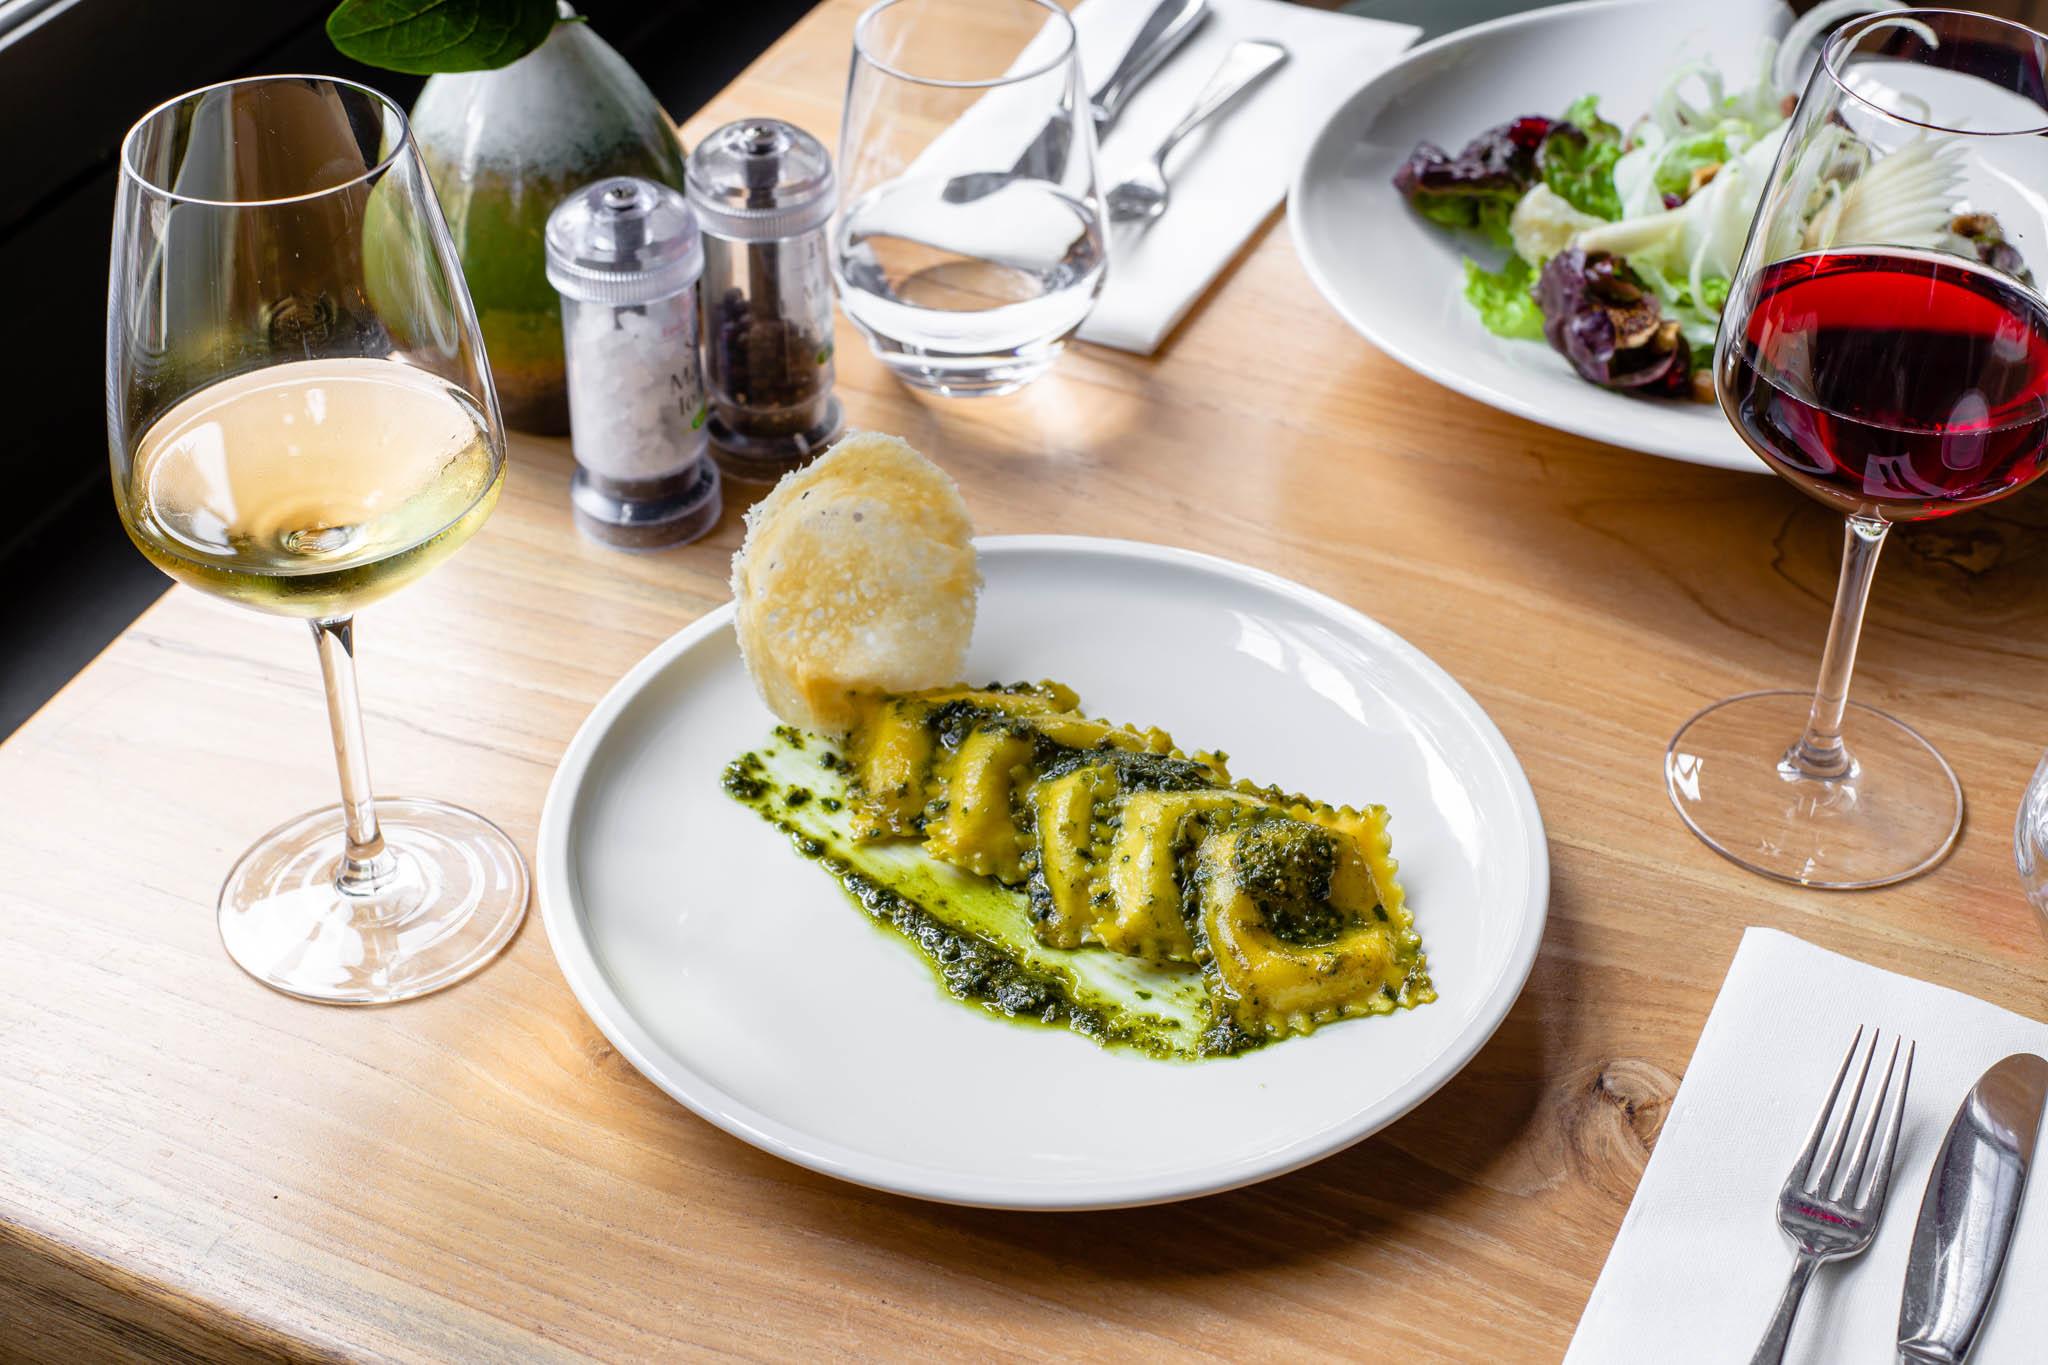 Italian dishes on the table of an Italian restaurant